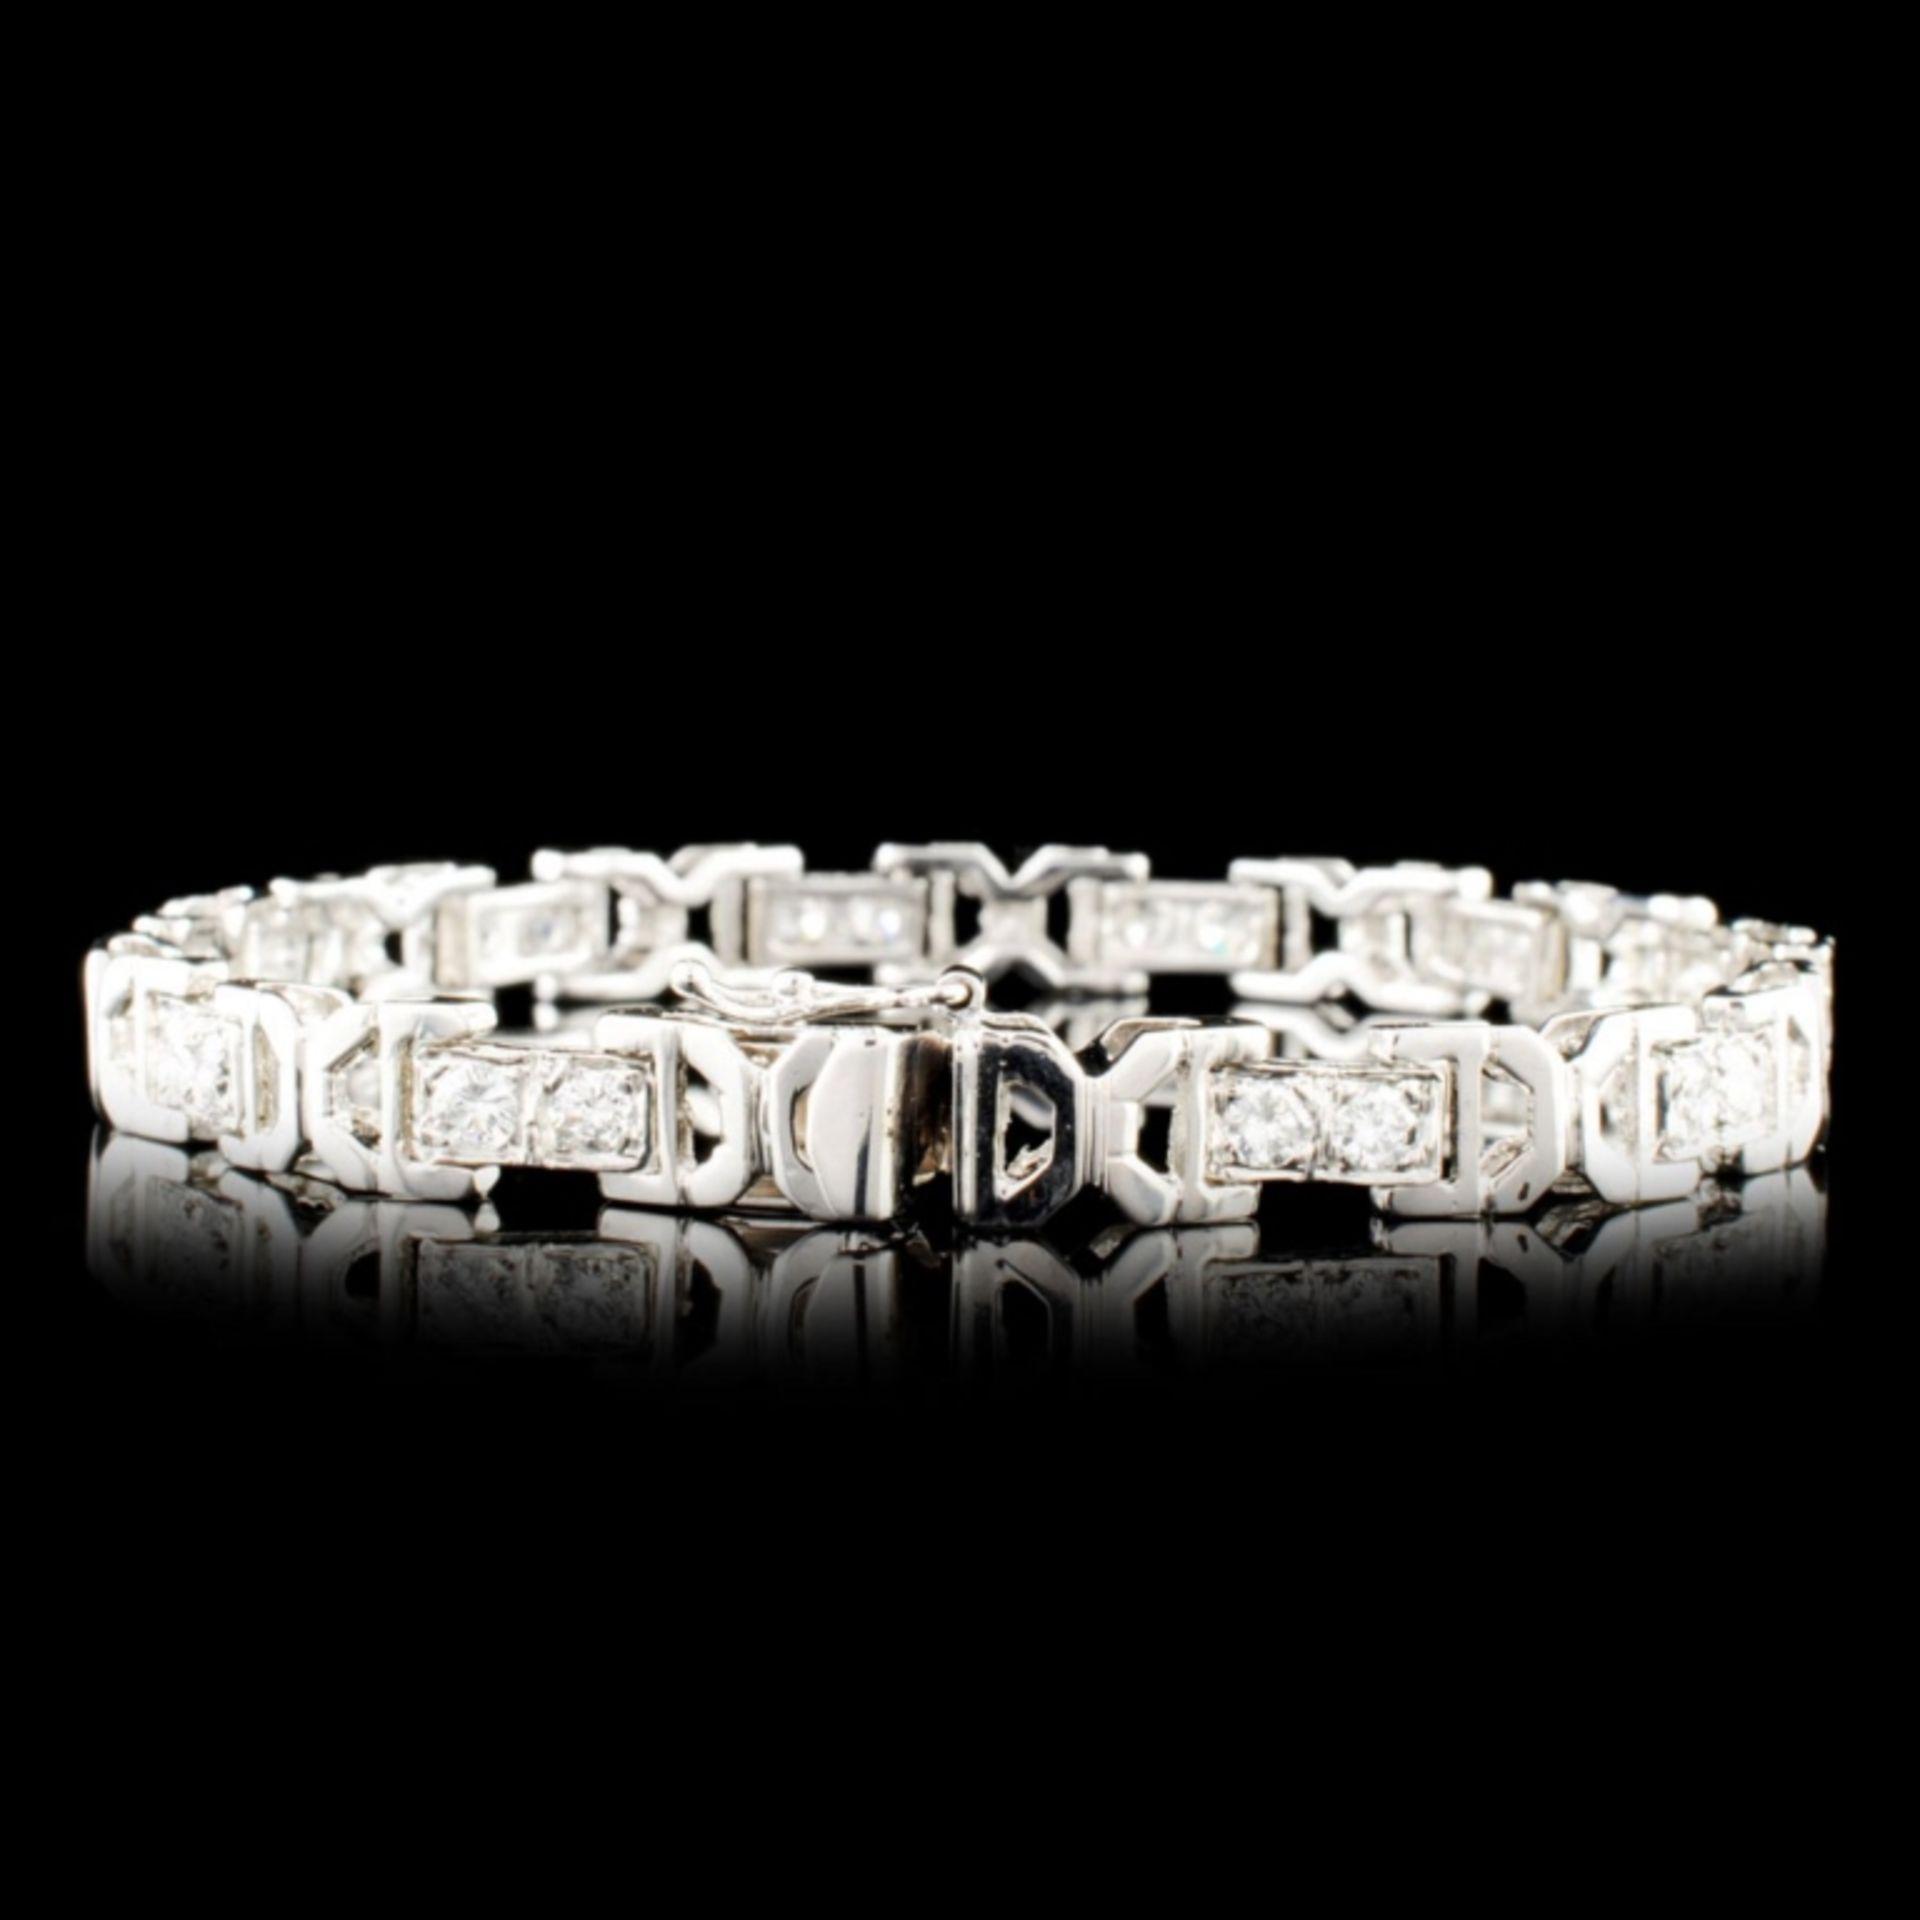 14K Gold 2.01ctw Diamond Bracelet - Image 2 of 4